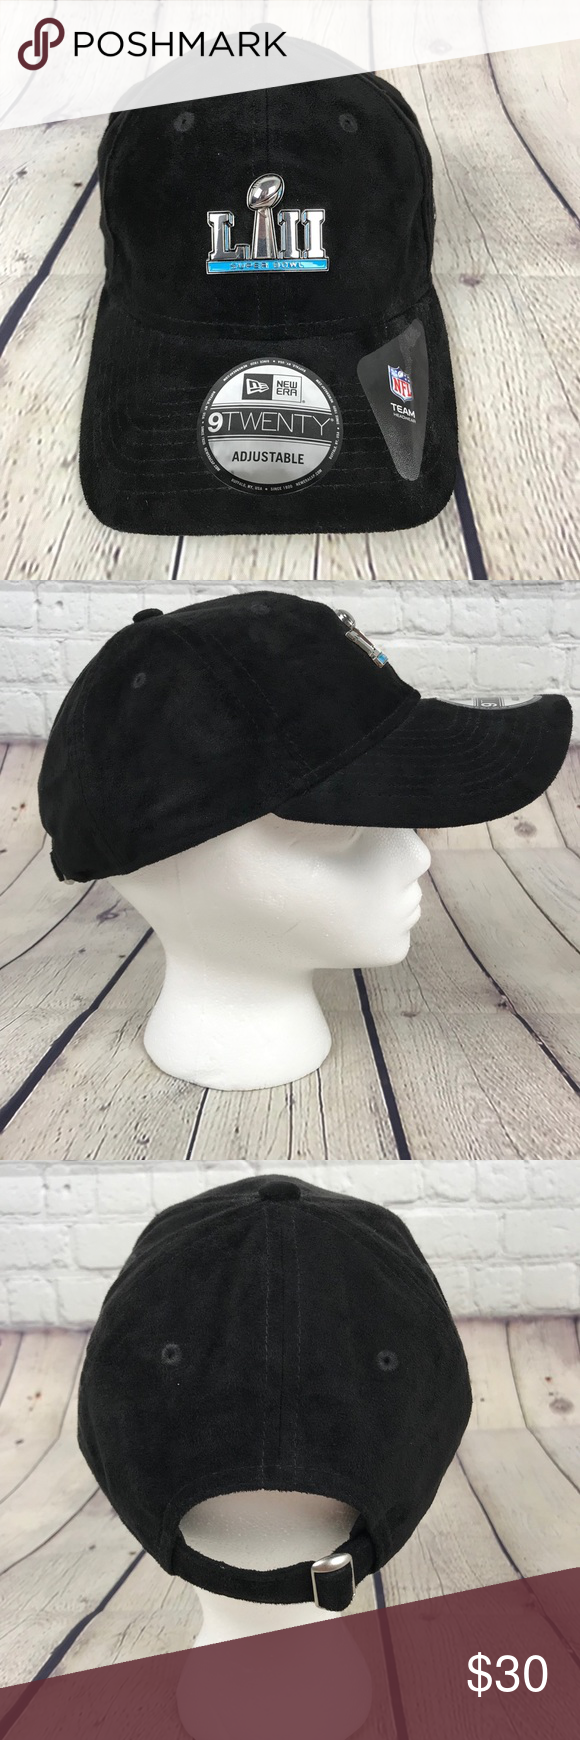 quality design 45515 418ae NFL Super Bowl LII 52 New Era Adjustable Hat Cap New Era 9 Twenty Superbowl  LII hat. Black, 100% polyester. From the 2018 Eagles Patriots Super Bowl  game.